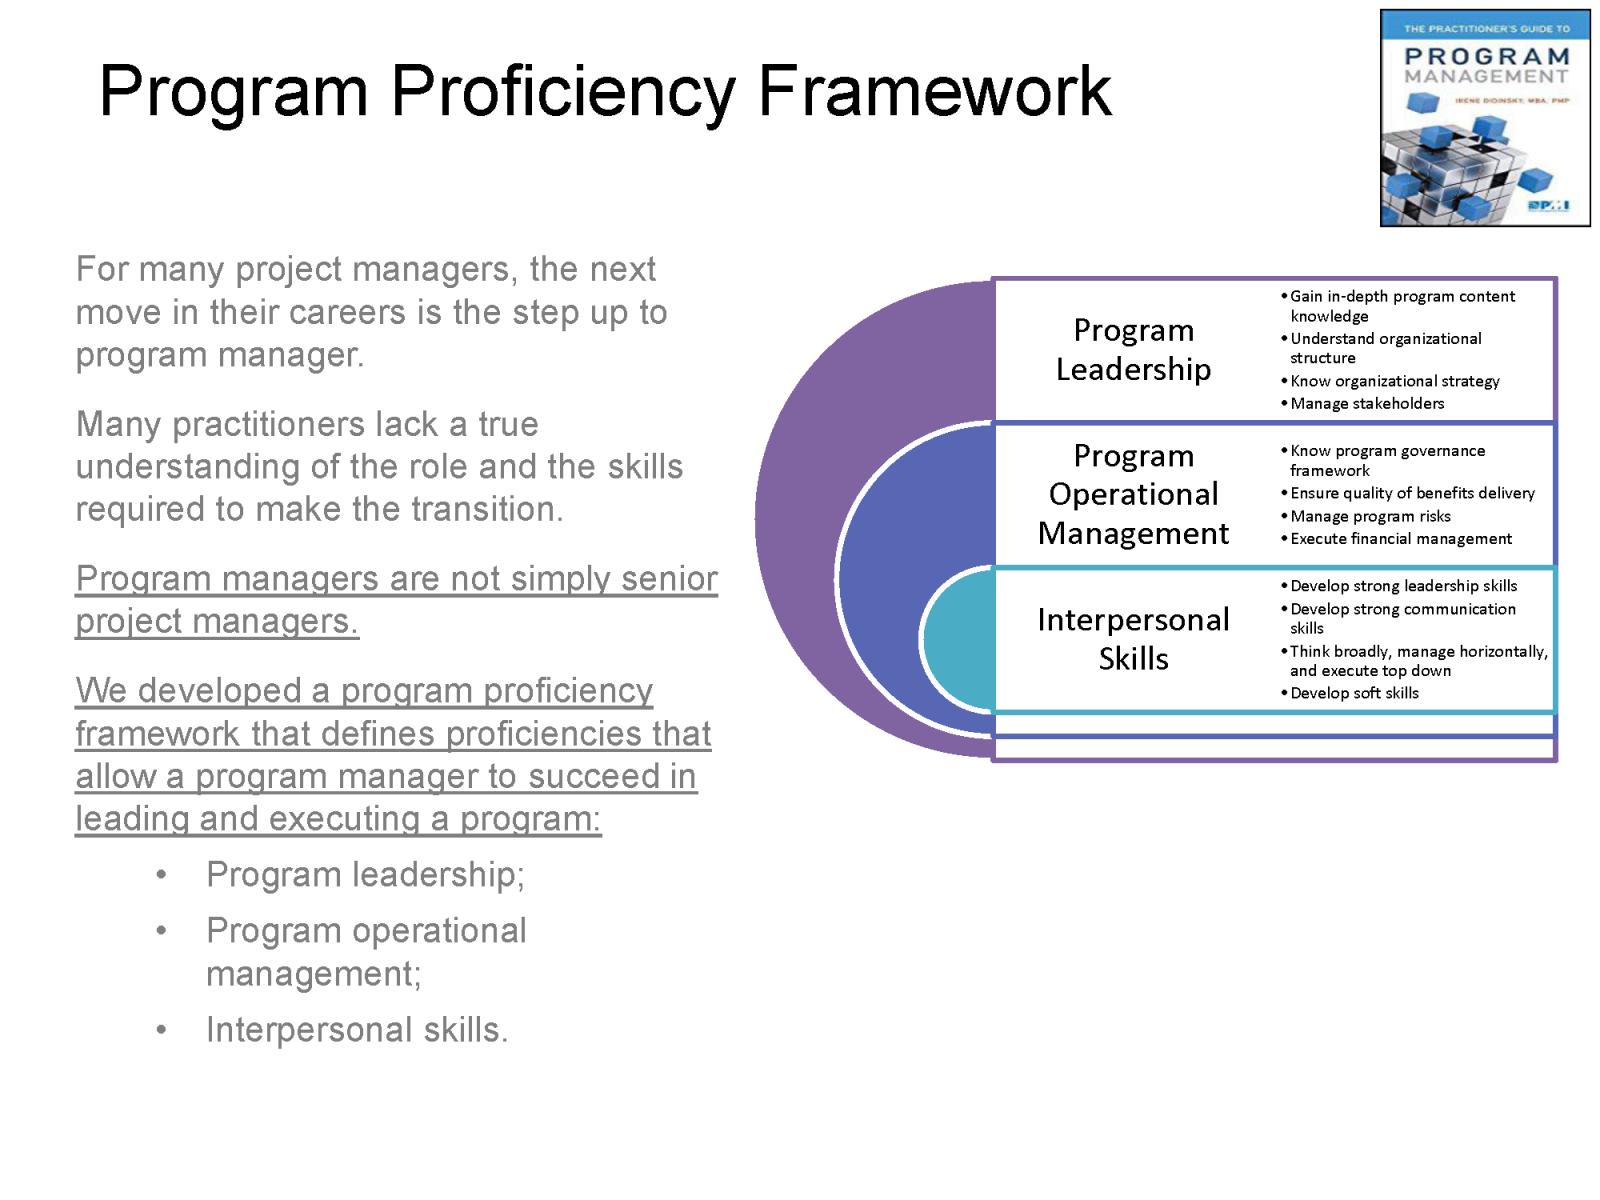 ProjectManagementcom webinar_Irene Didinsky_03282018_v01 (1)_Page_12